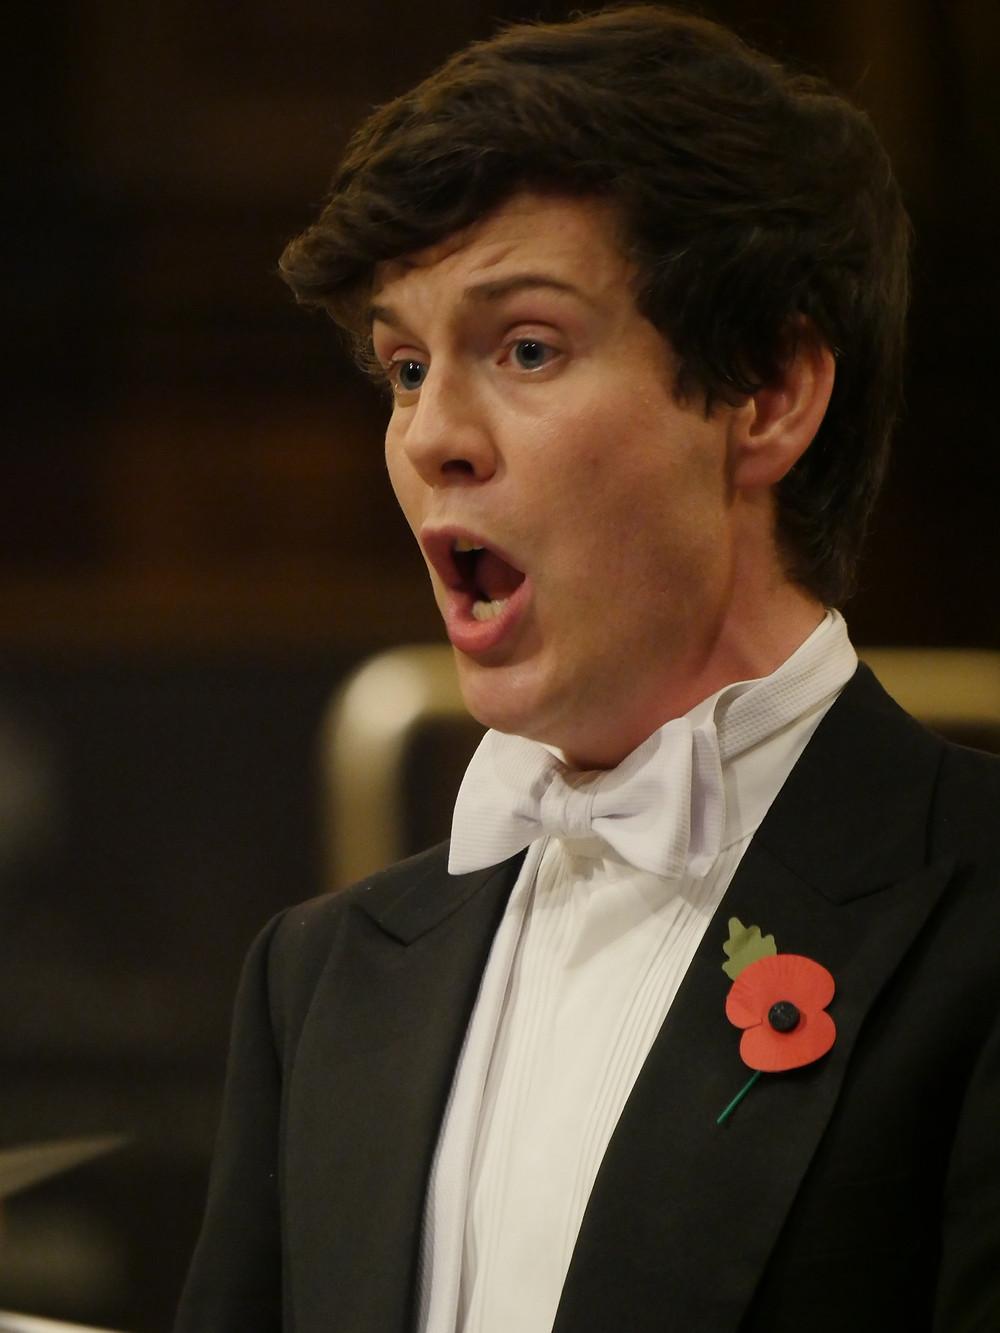 Tenor soloist, James Micklethwaite